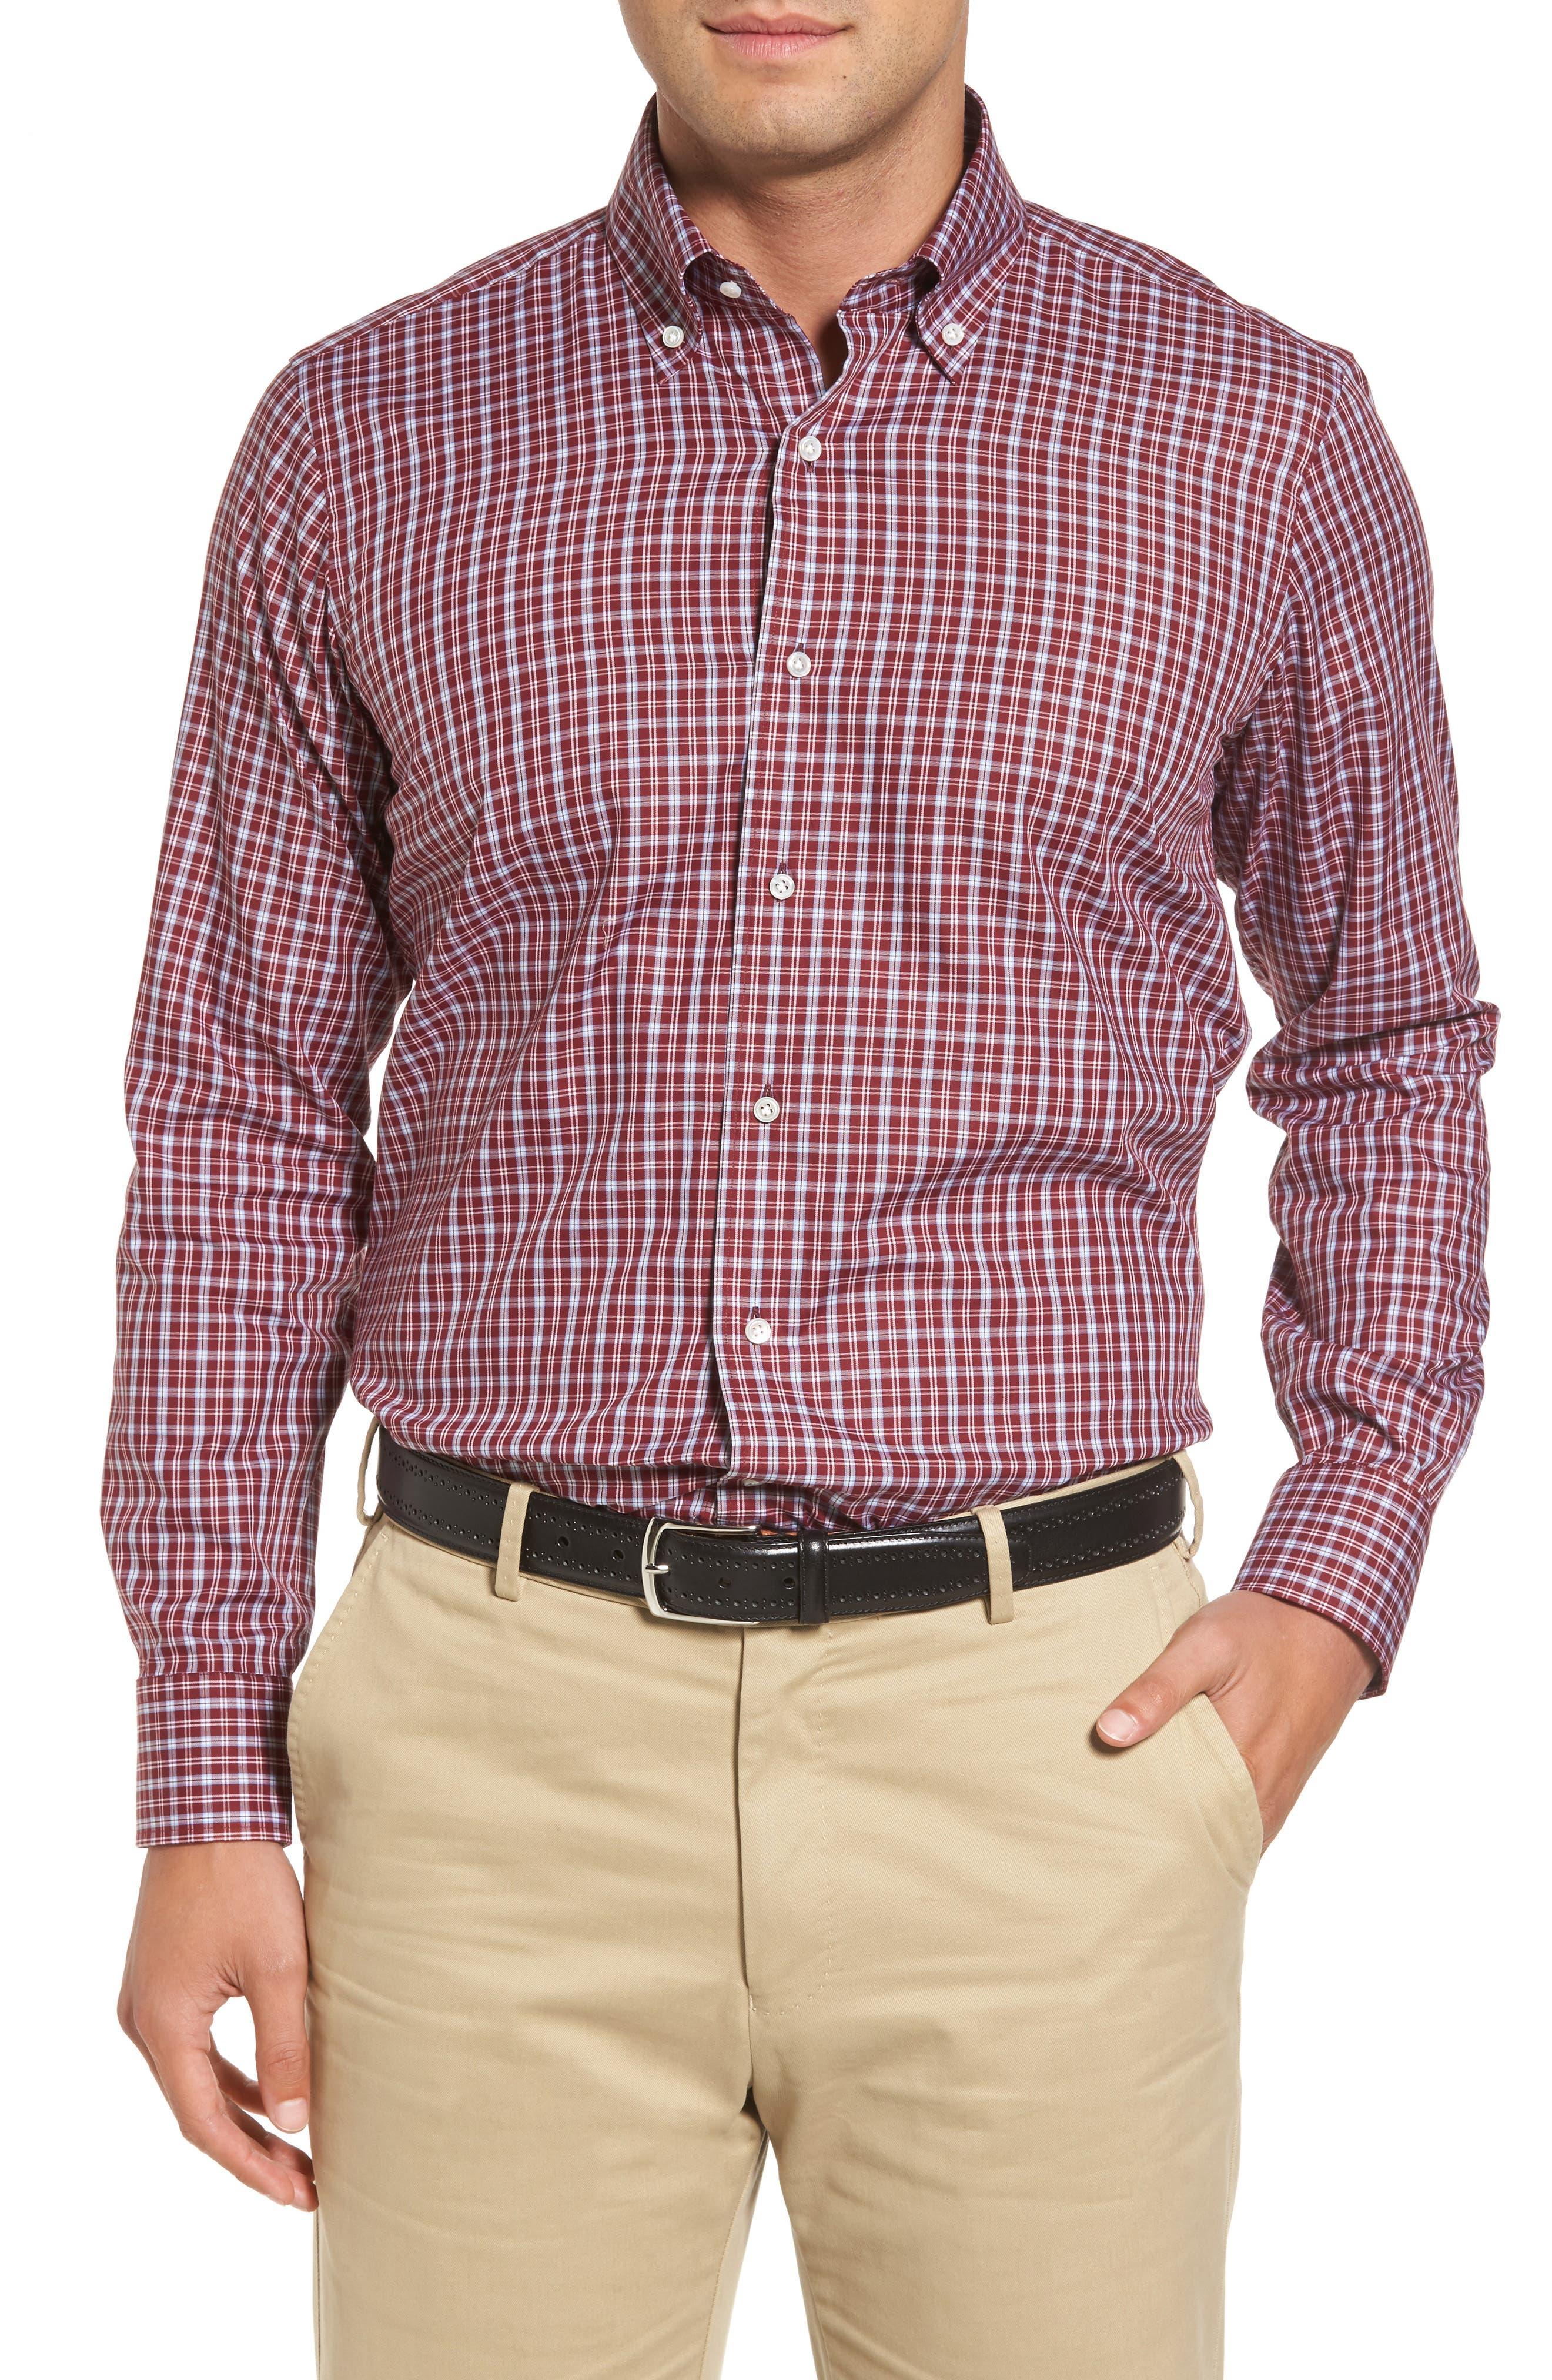 Main Image - Peter Millar Isle Check Regular Fit Sport Shirt